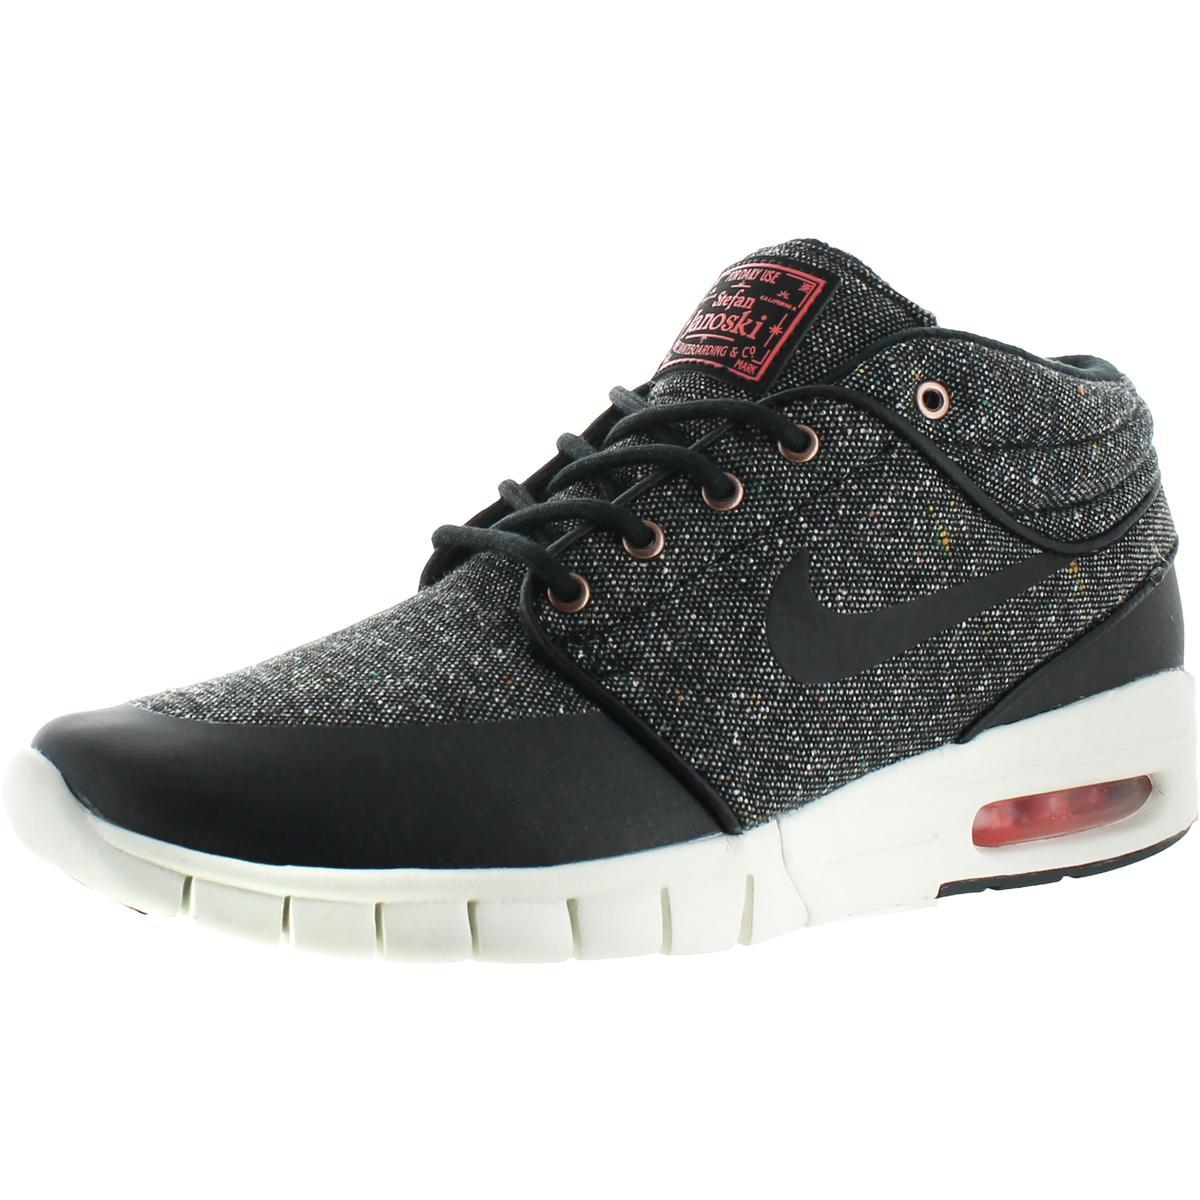 separation shoes 9016e 0ab78 Details about Nike Mens Stefan Janoski Max Mid Black Skate Shoes 6.5 Medium  (B,M) BHFO 9808